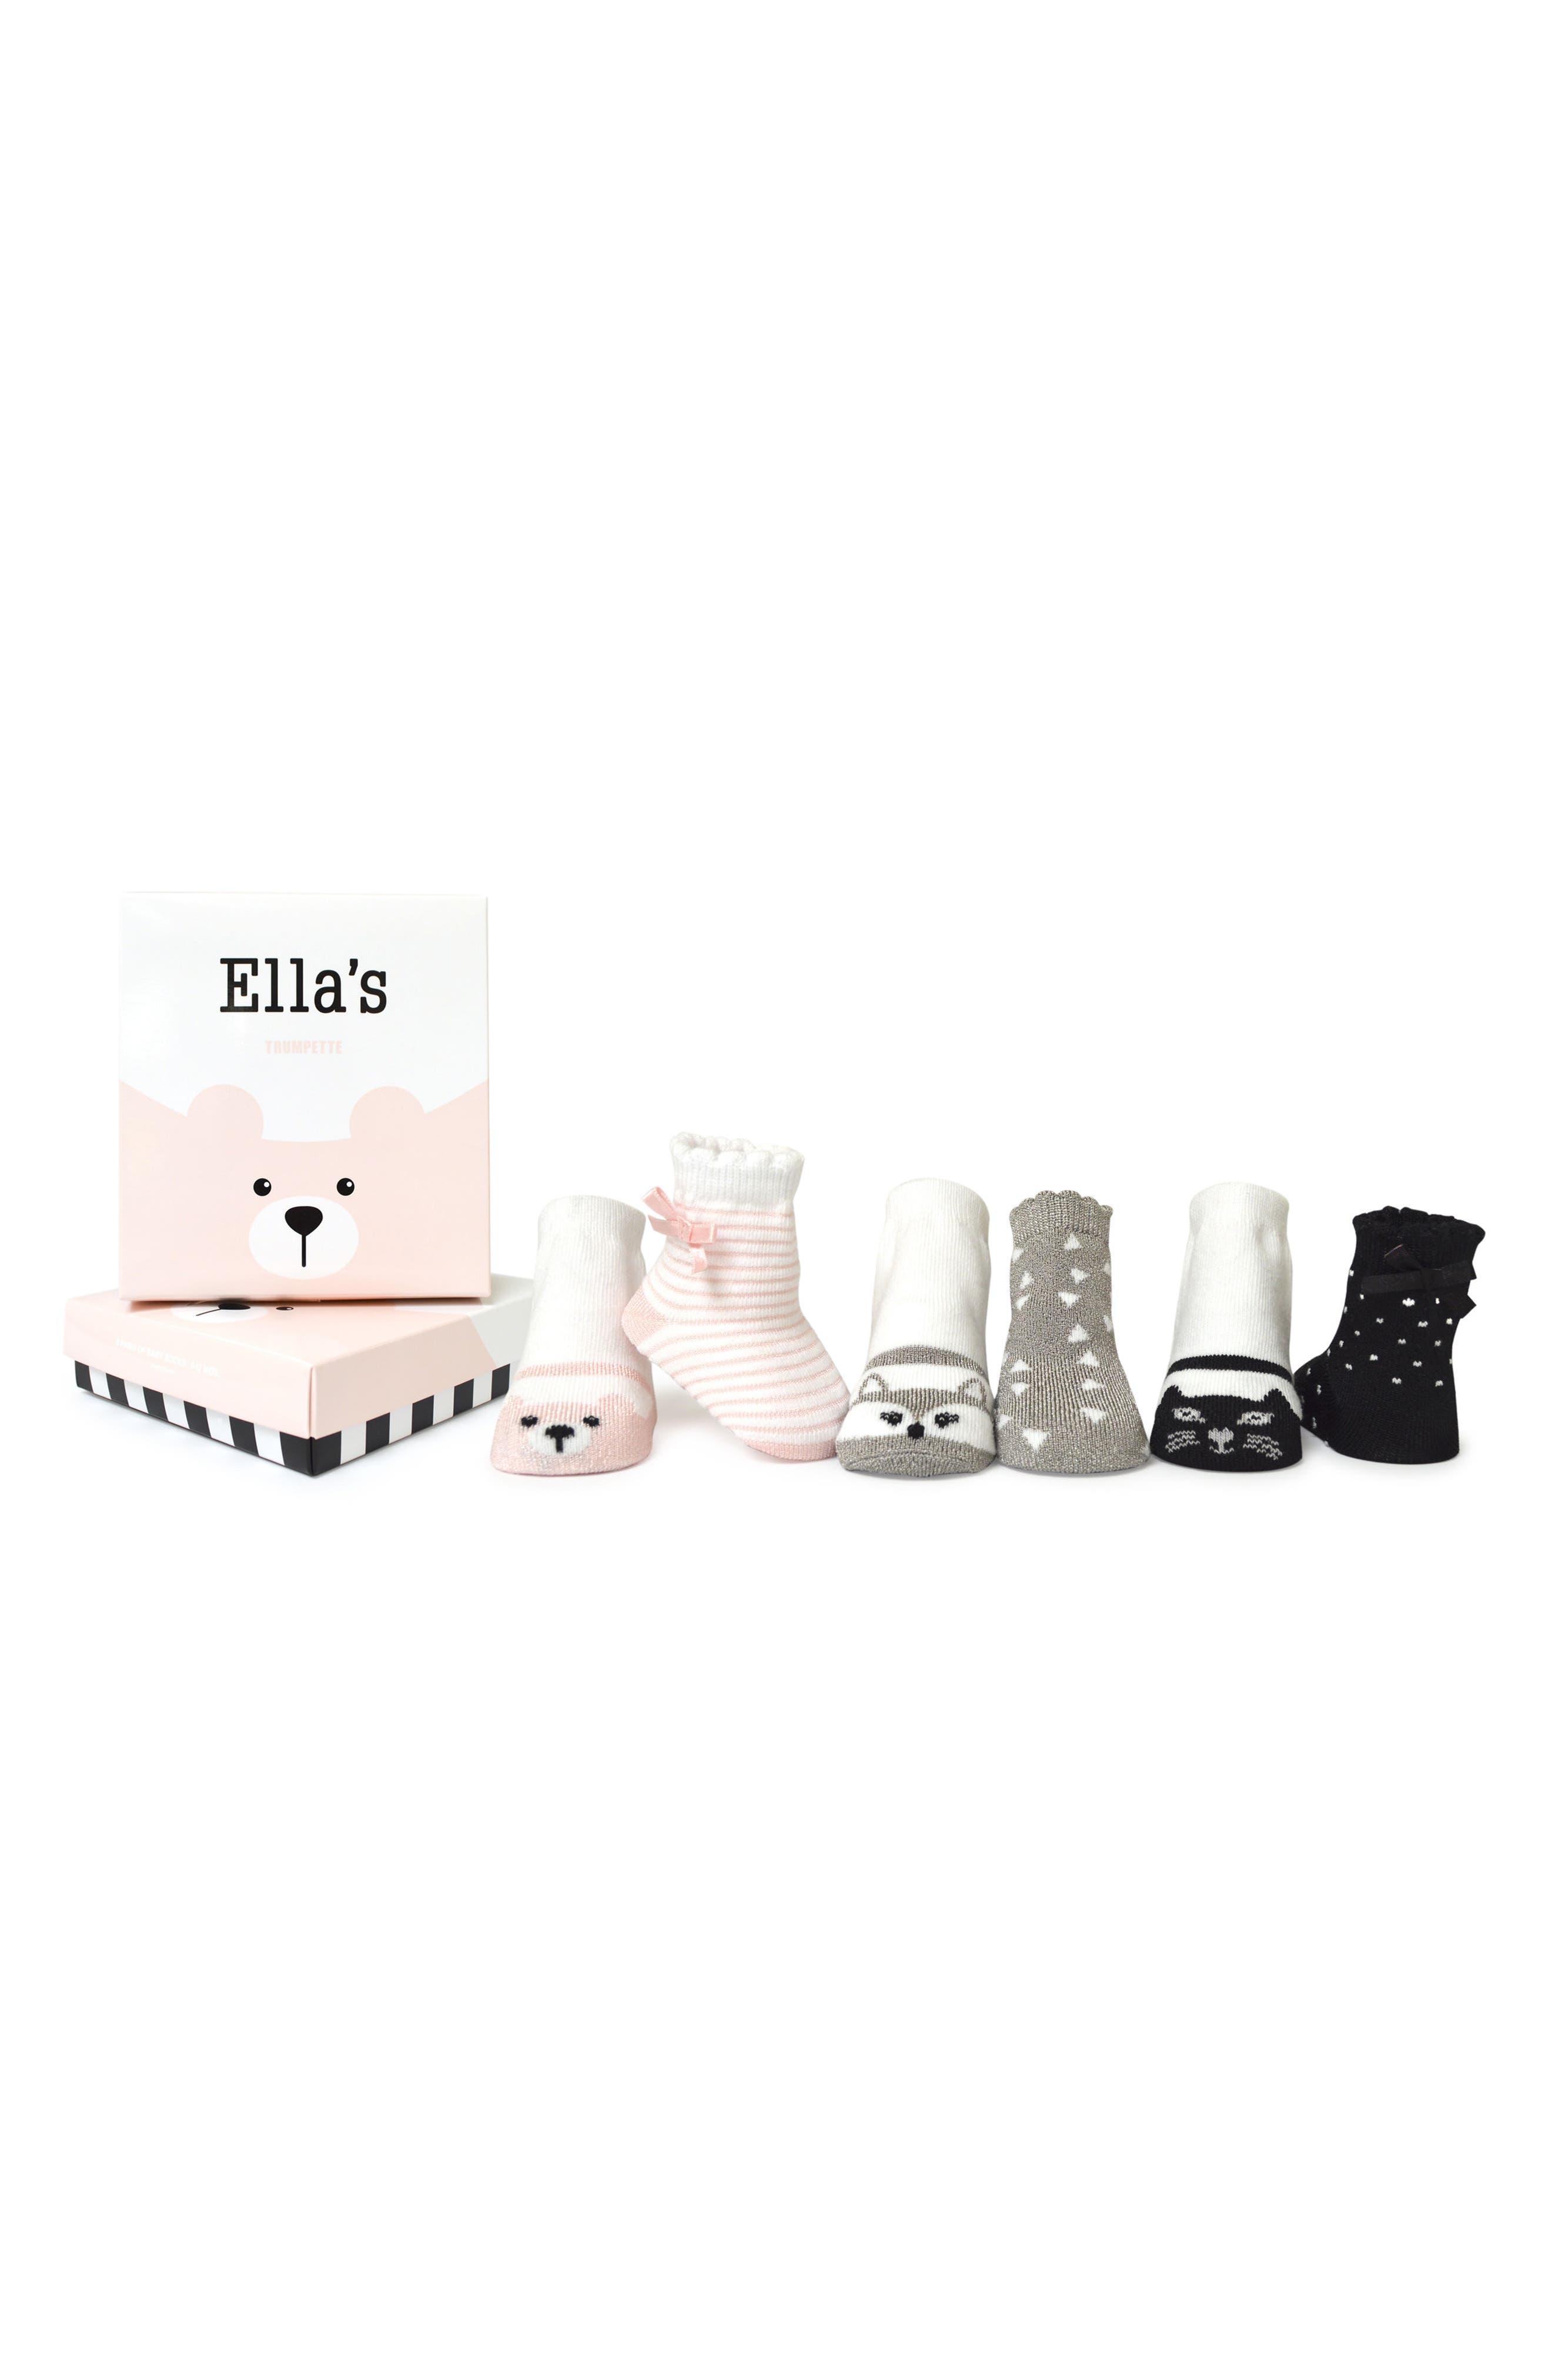 Ella's 6-Pack Socks,                             Main thumbnail 1, color,                             100